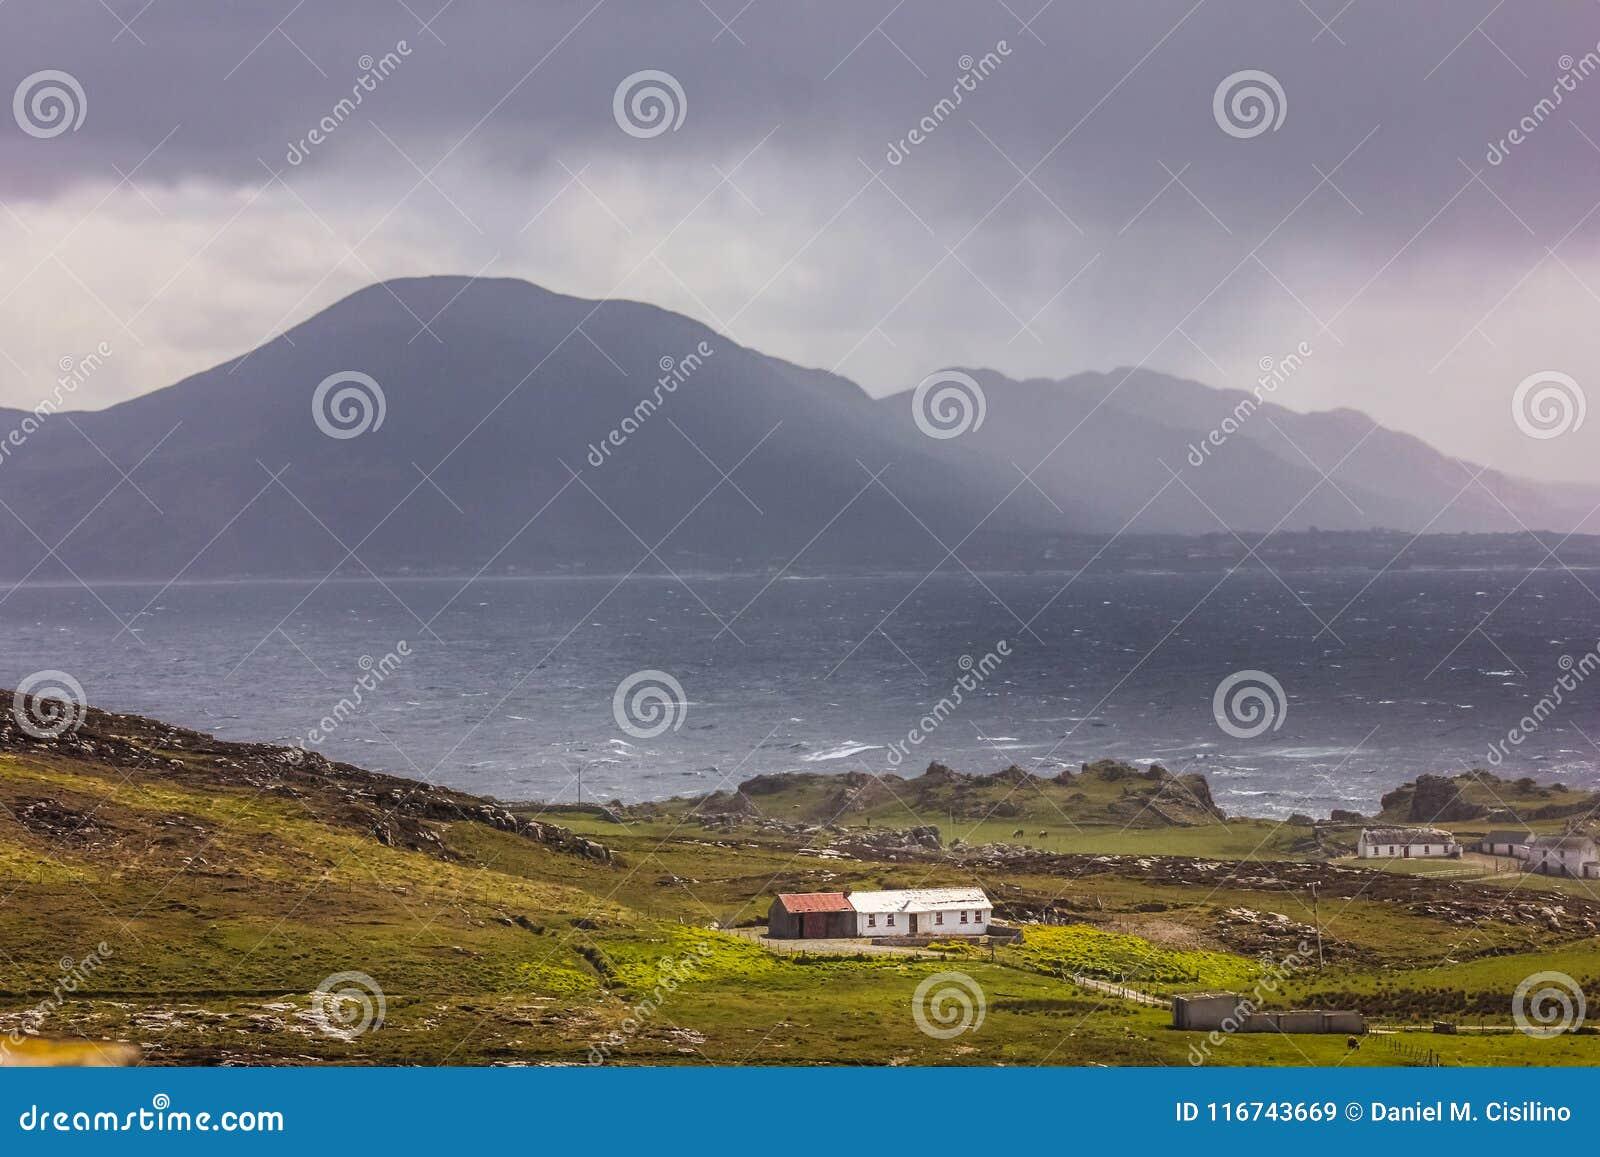 Paisagem Cabeça de Malin Inishowen r ireland